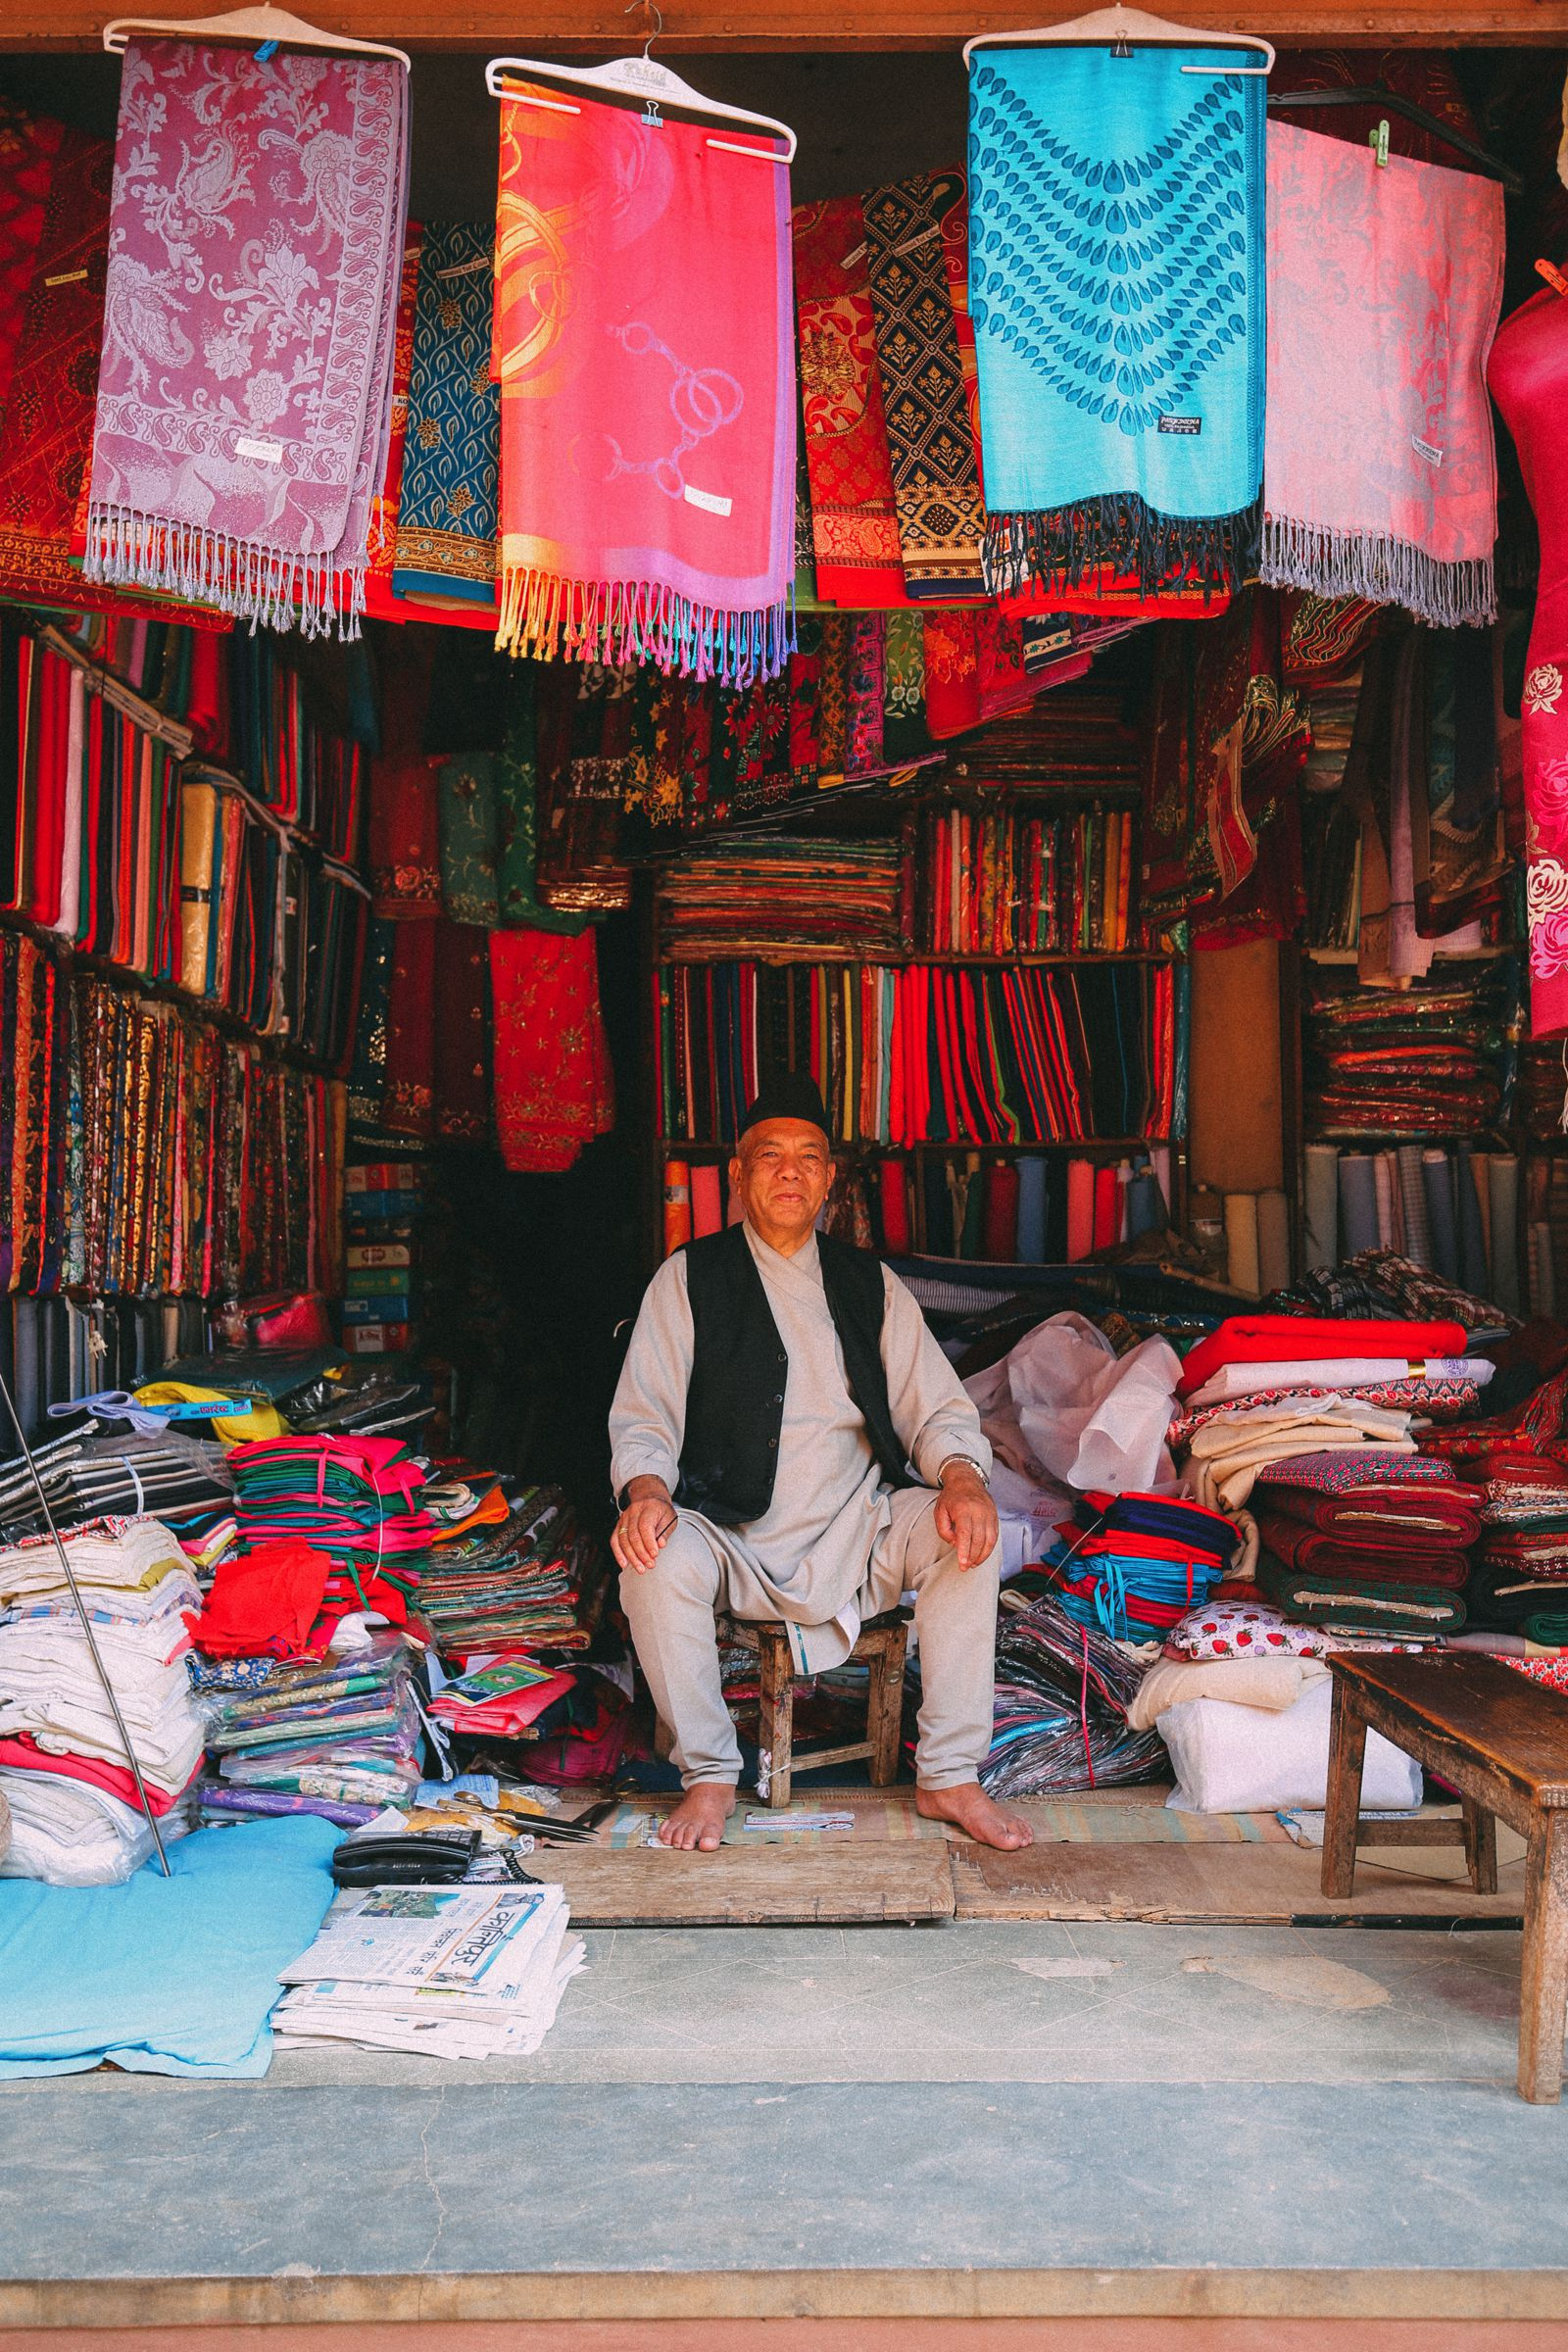 Photos And Postcards From Nepal... Chitwan, Kathmandu, Bhaktapur, Panauti, Pokhara, Tansen, Palpa, Lumbini (7)